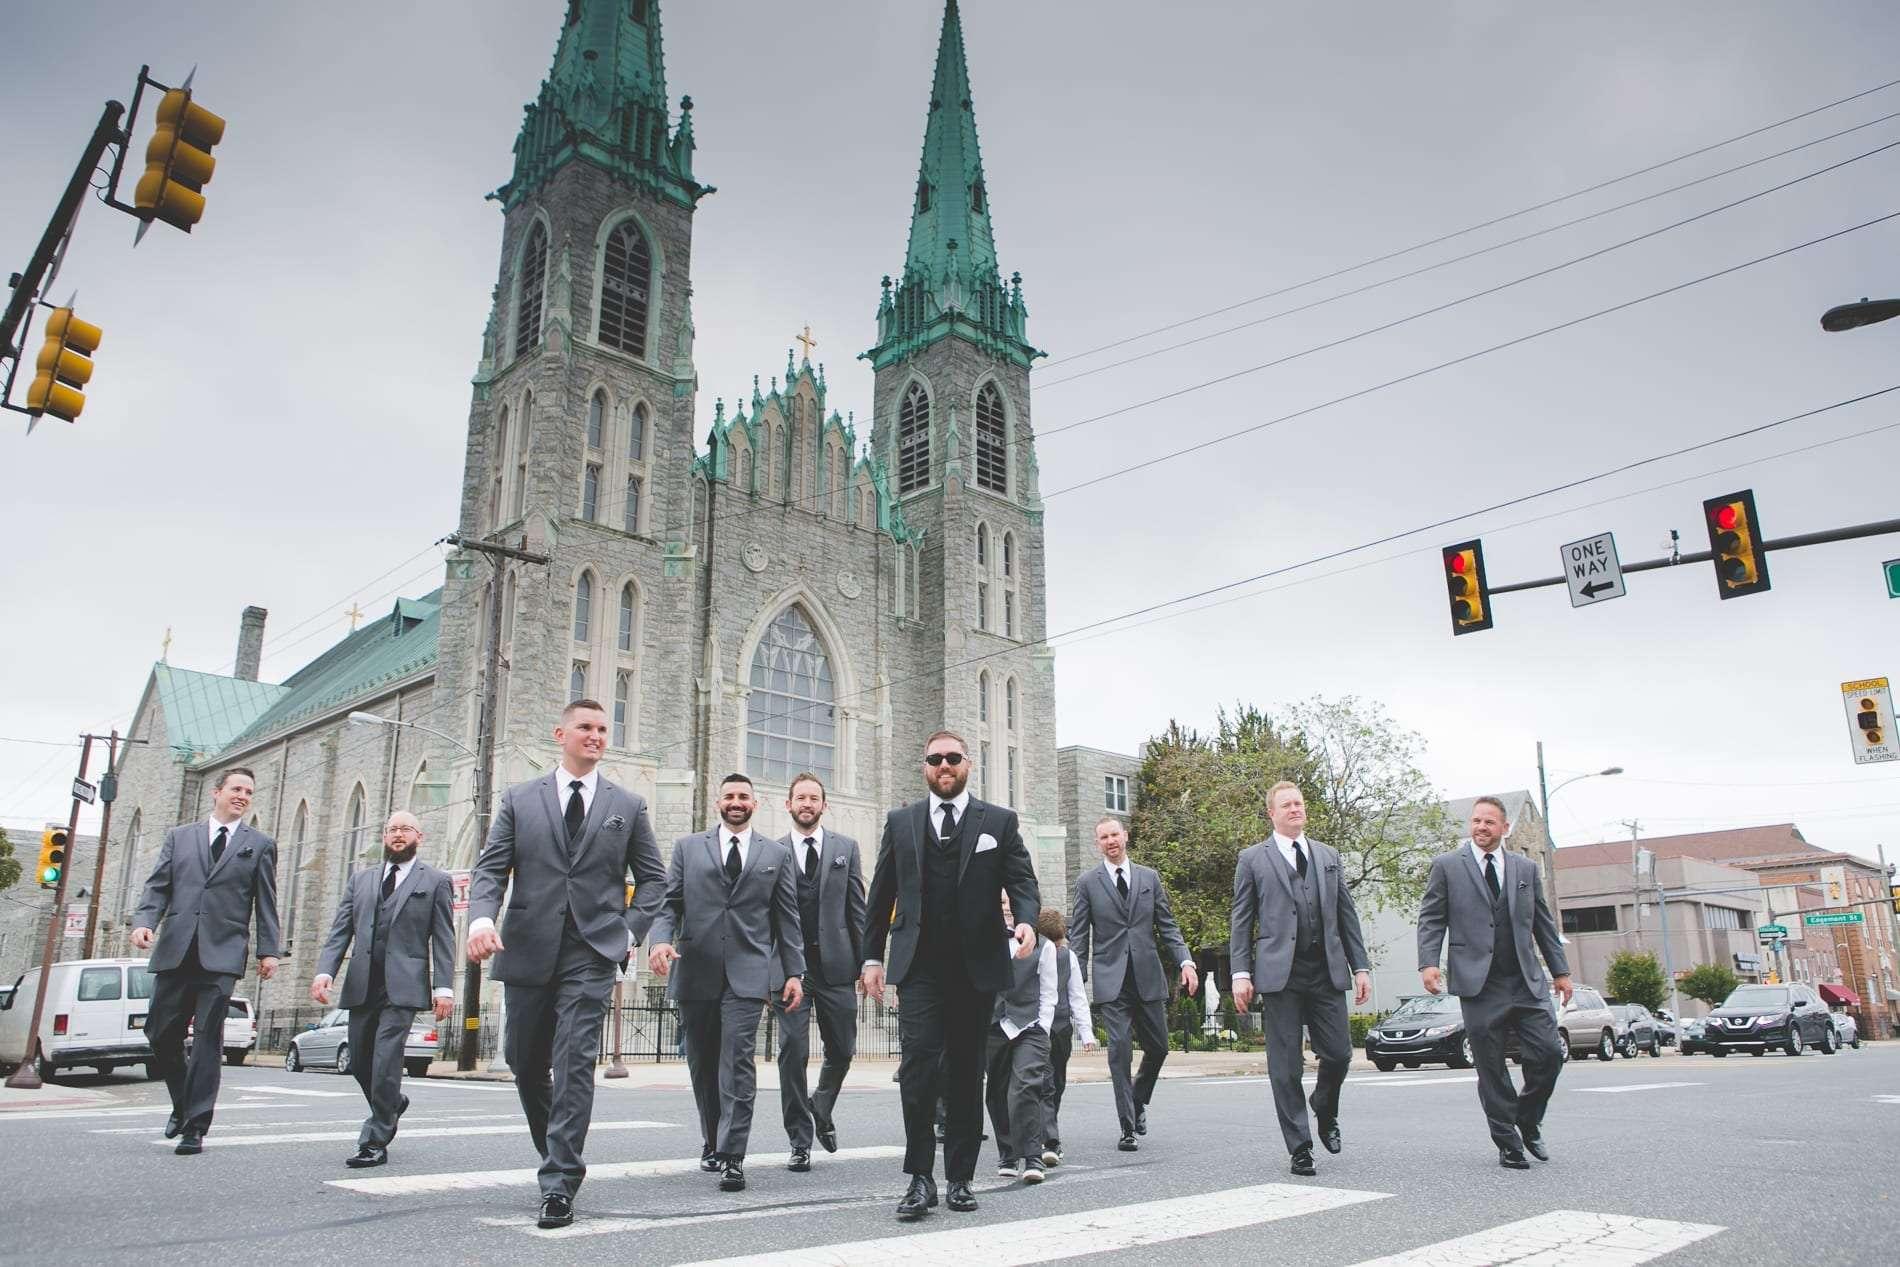 St. Alderberts wedding philadelphia